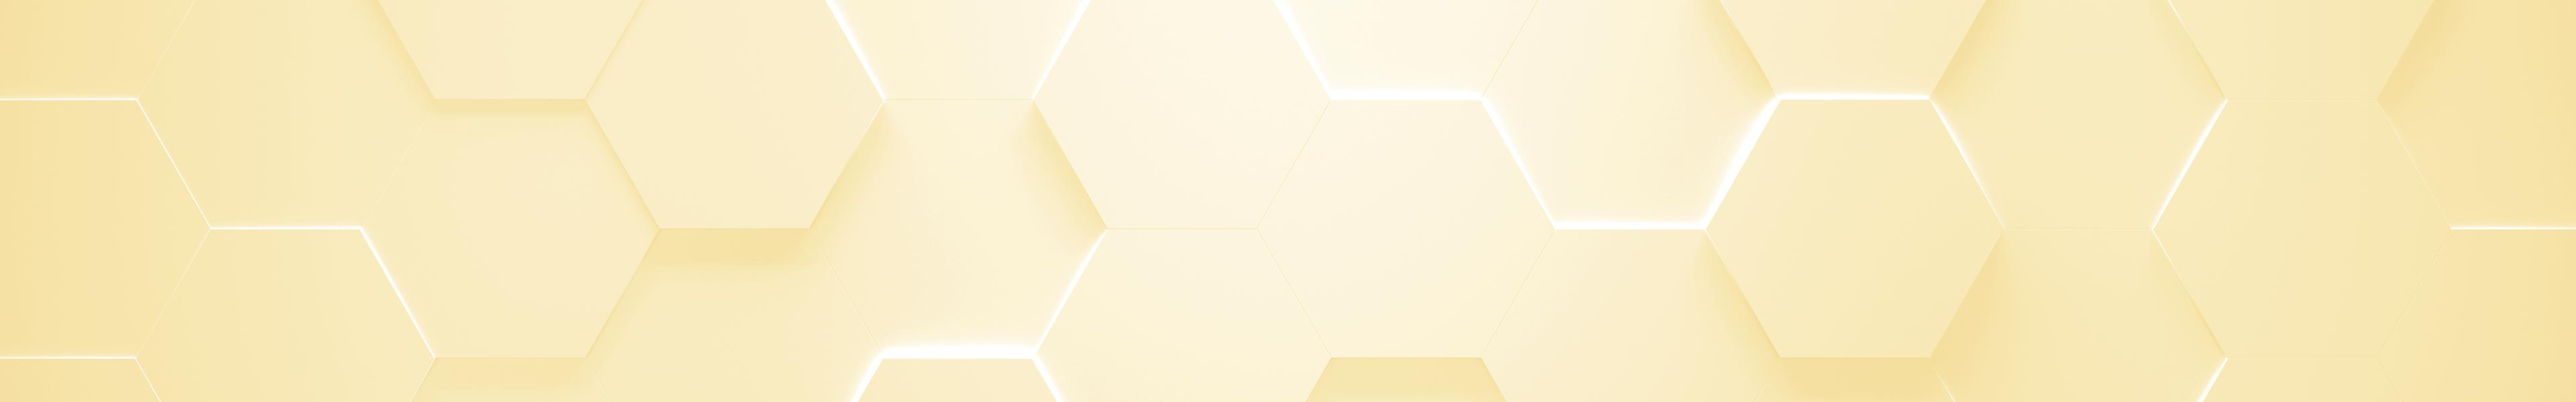 SLIDER_BACKGROUND_4K_3840x600_Hexagon_JPG